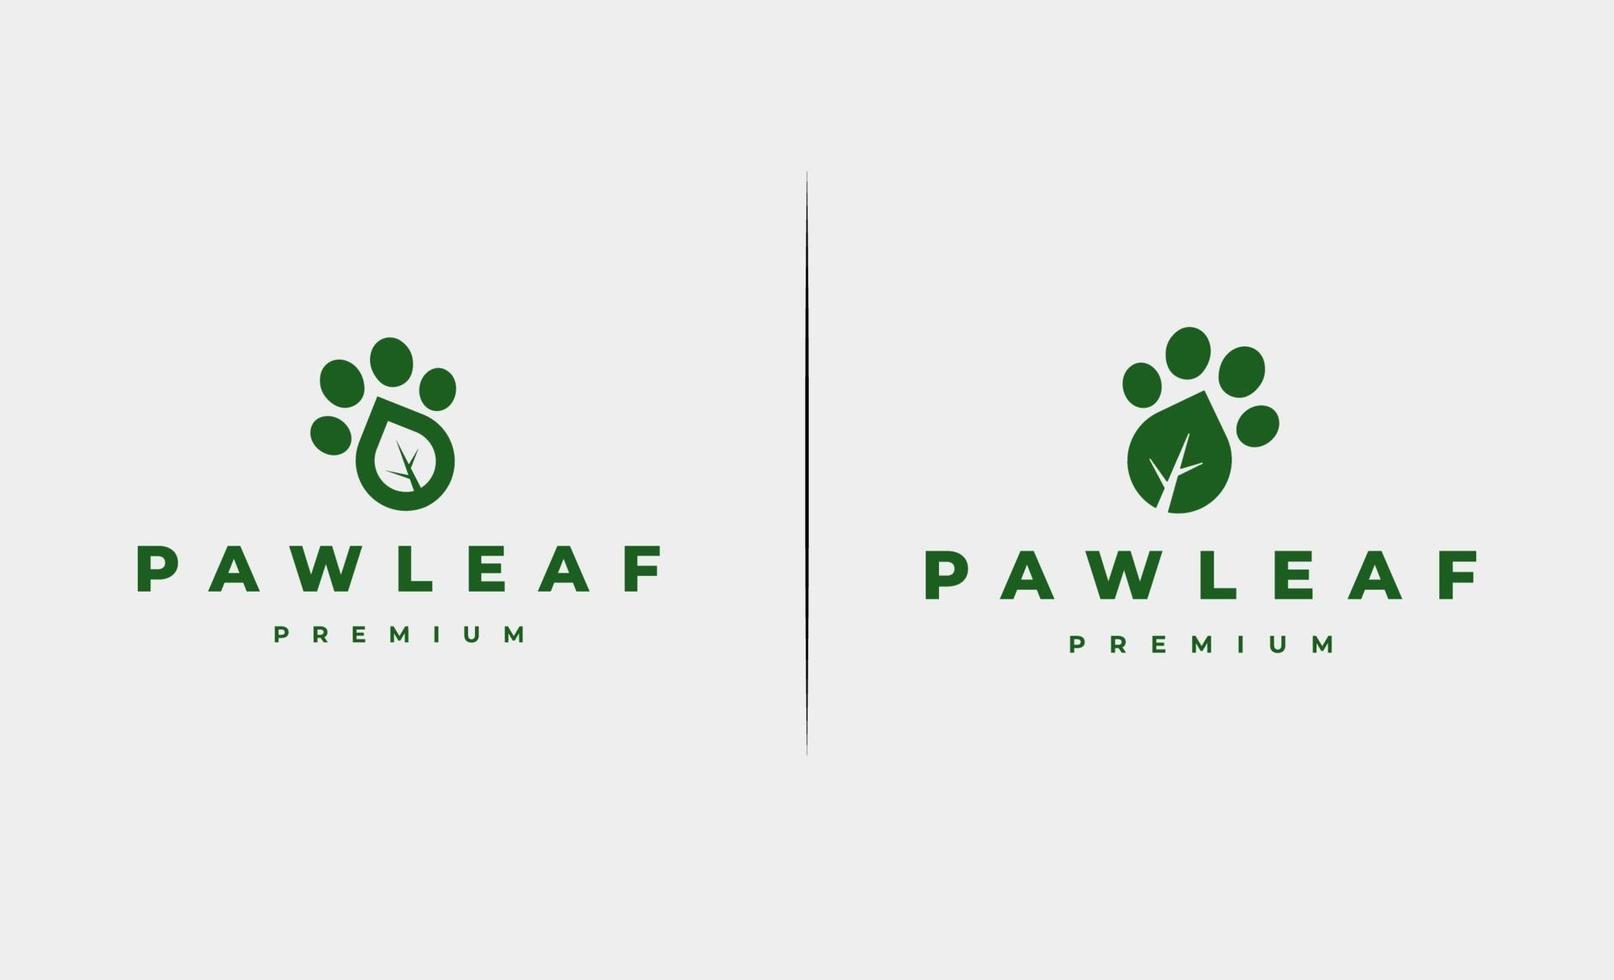 paw leaf foot print logo design vektorillustration vektor